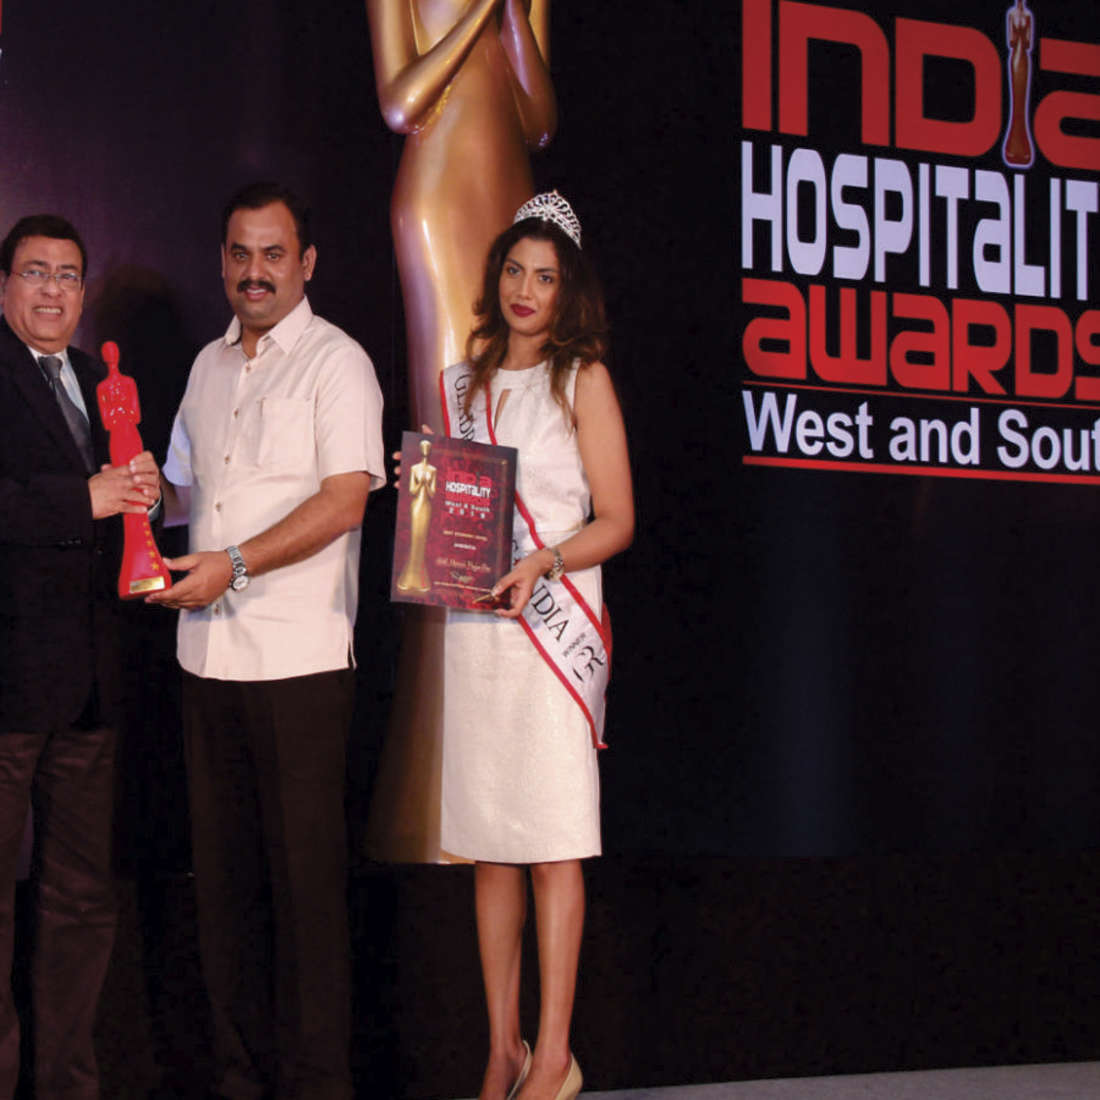 Manvins Hotels  award1